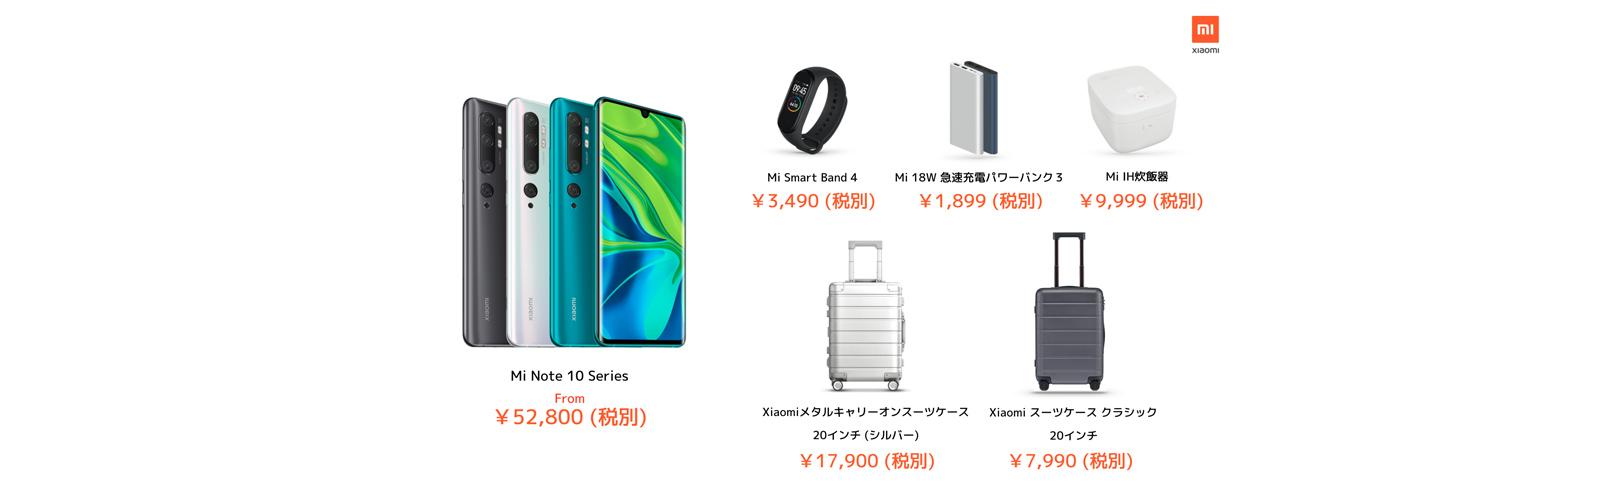 Xiaomi enters the Japanese market